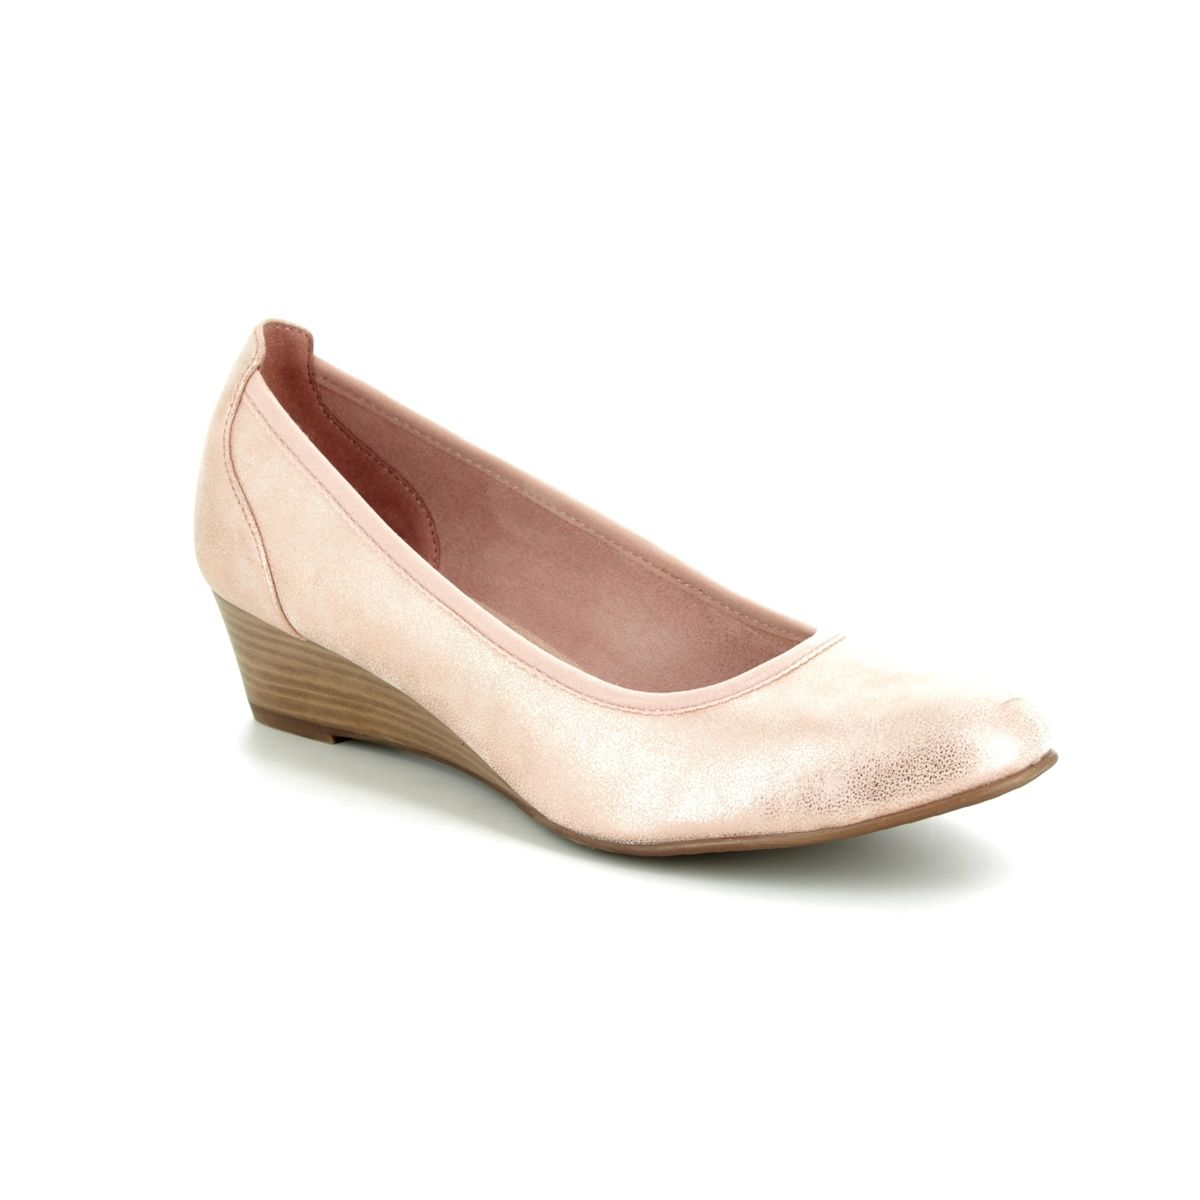 Tamaris Wedge Sandals Women Rose Gold Shoes Latest Fashion